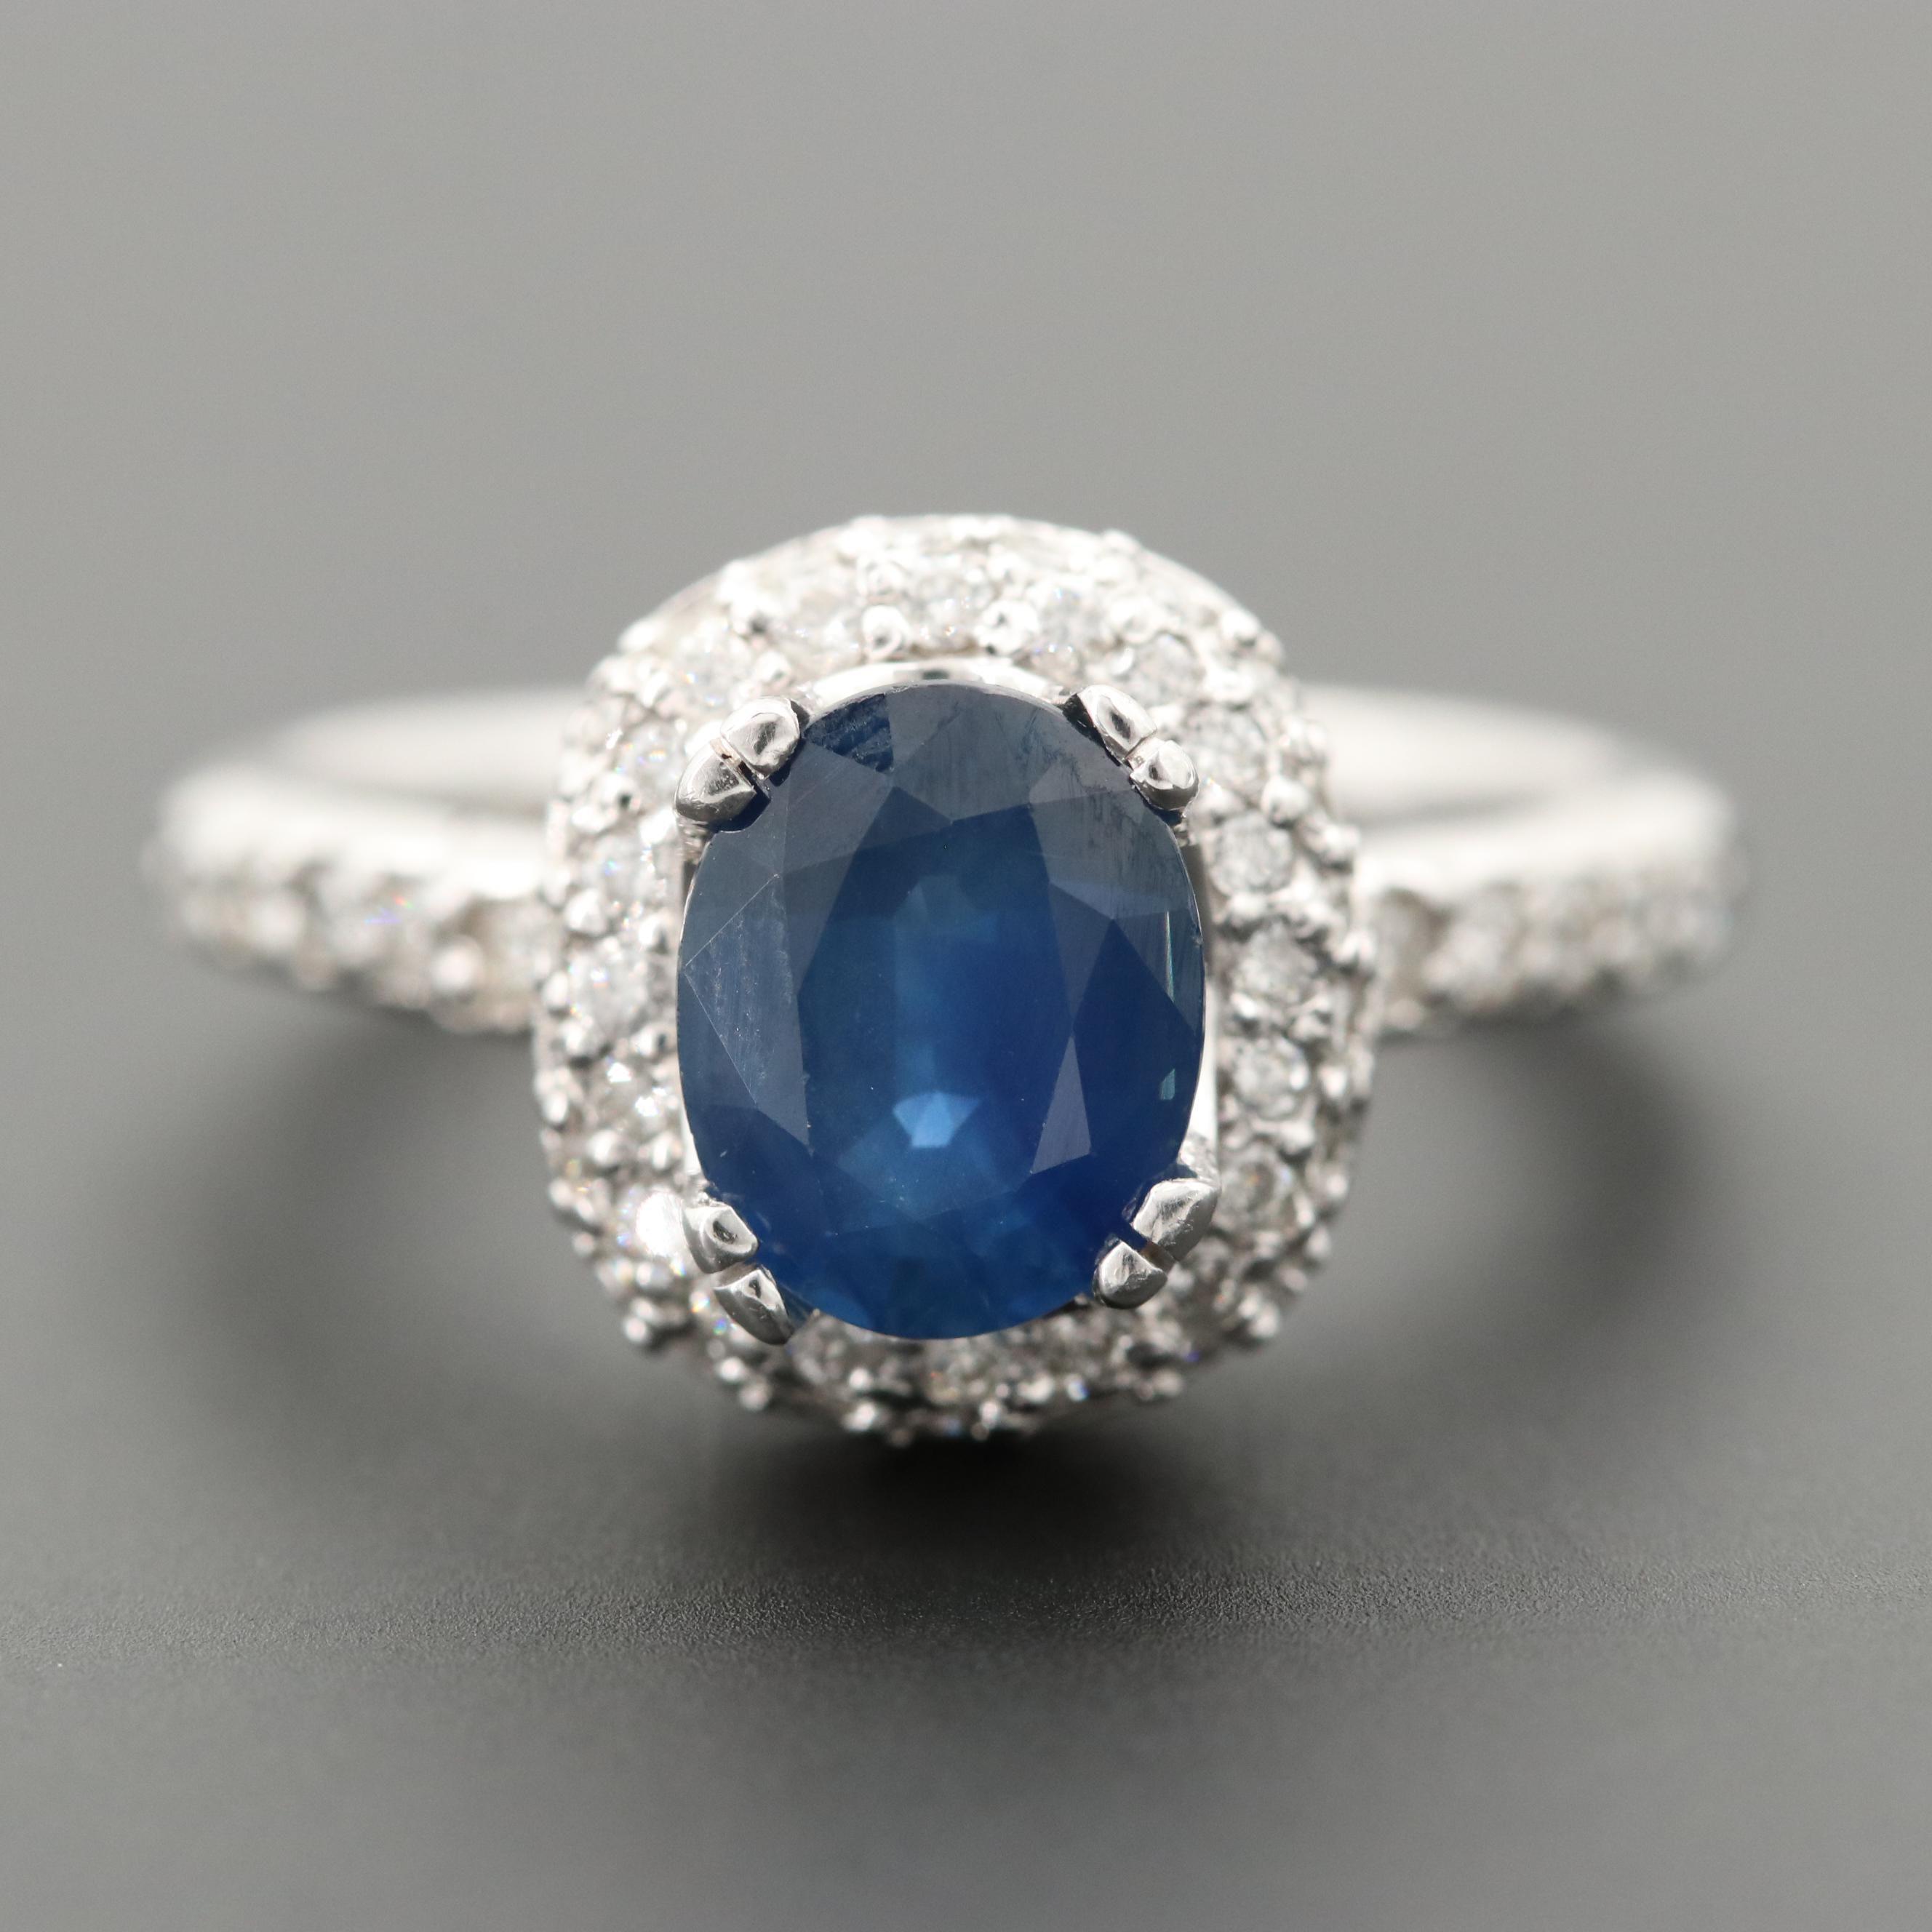 14K White Gold 1.67 CT Sapphire and 0.82 CTW Diamond Ring